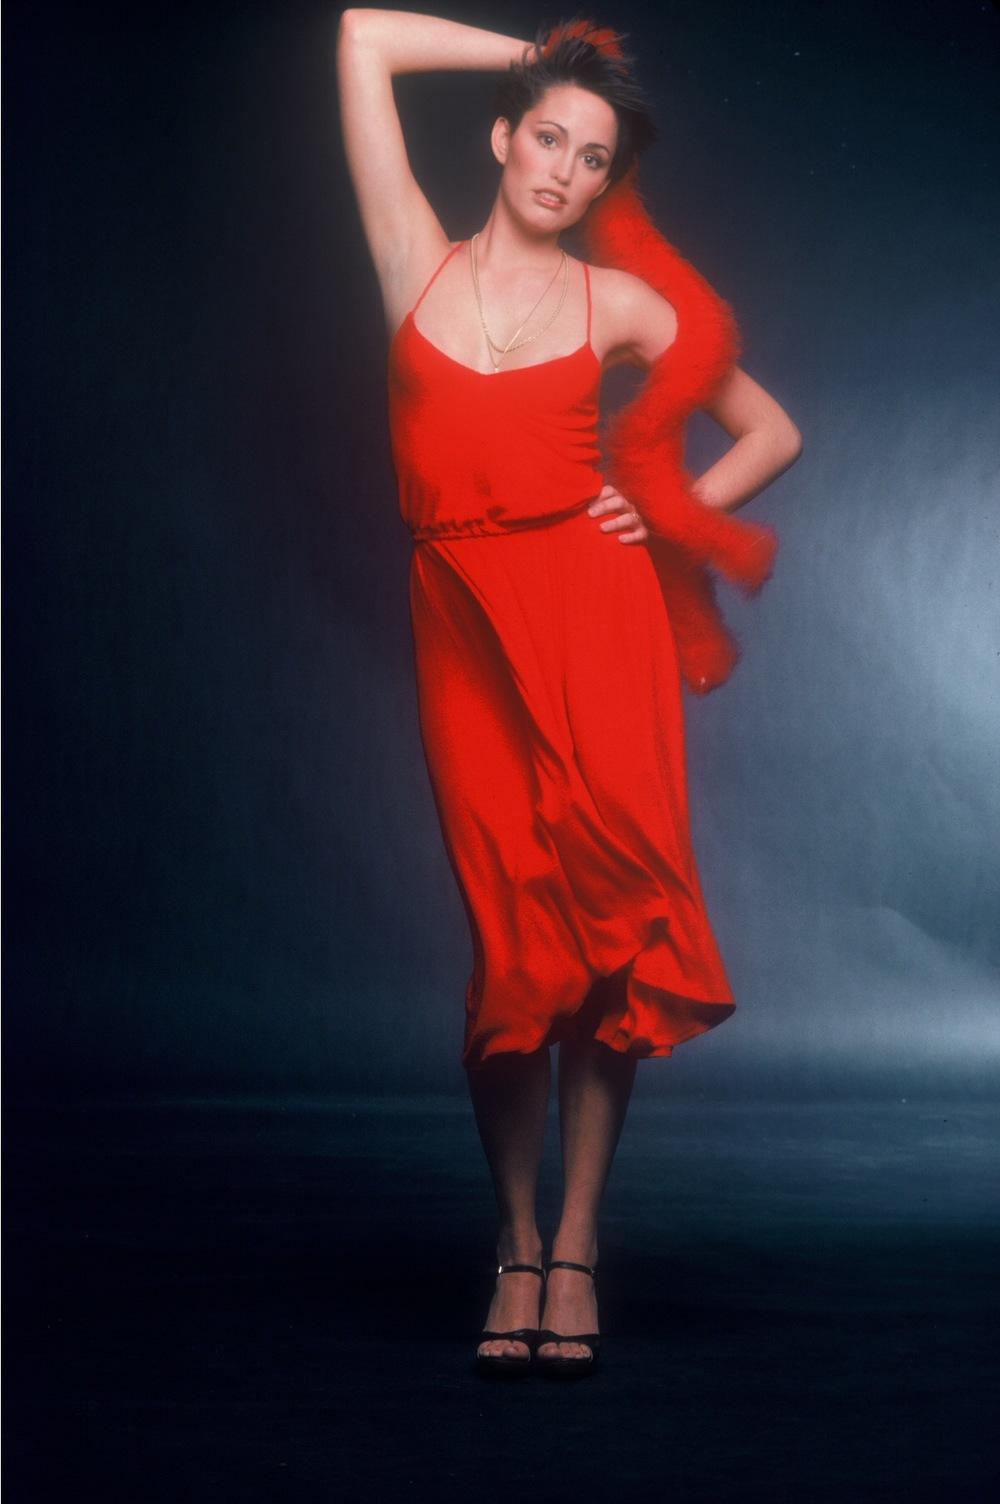 jill red dress.jpg